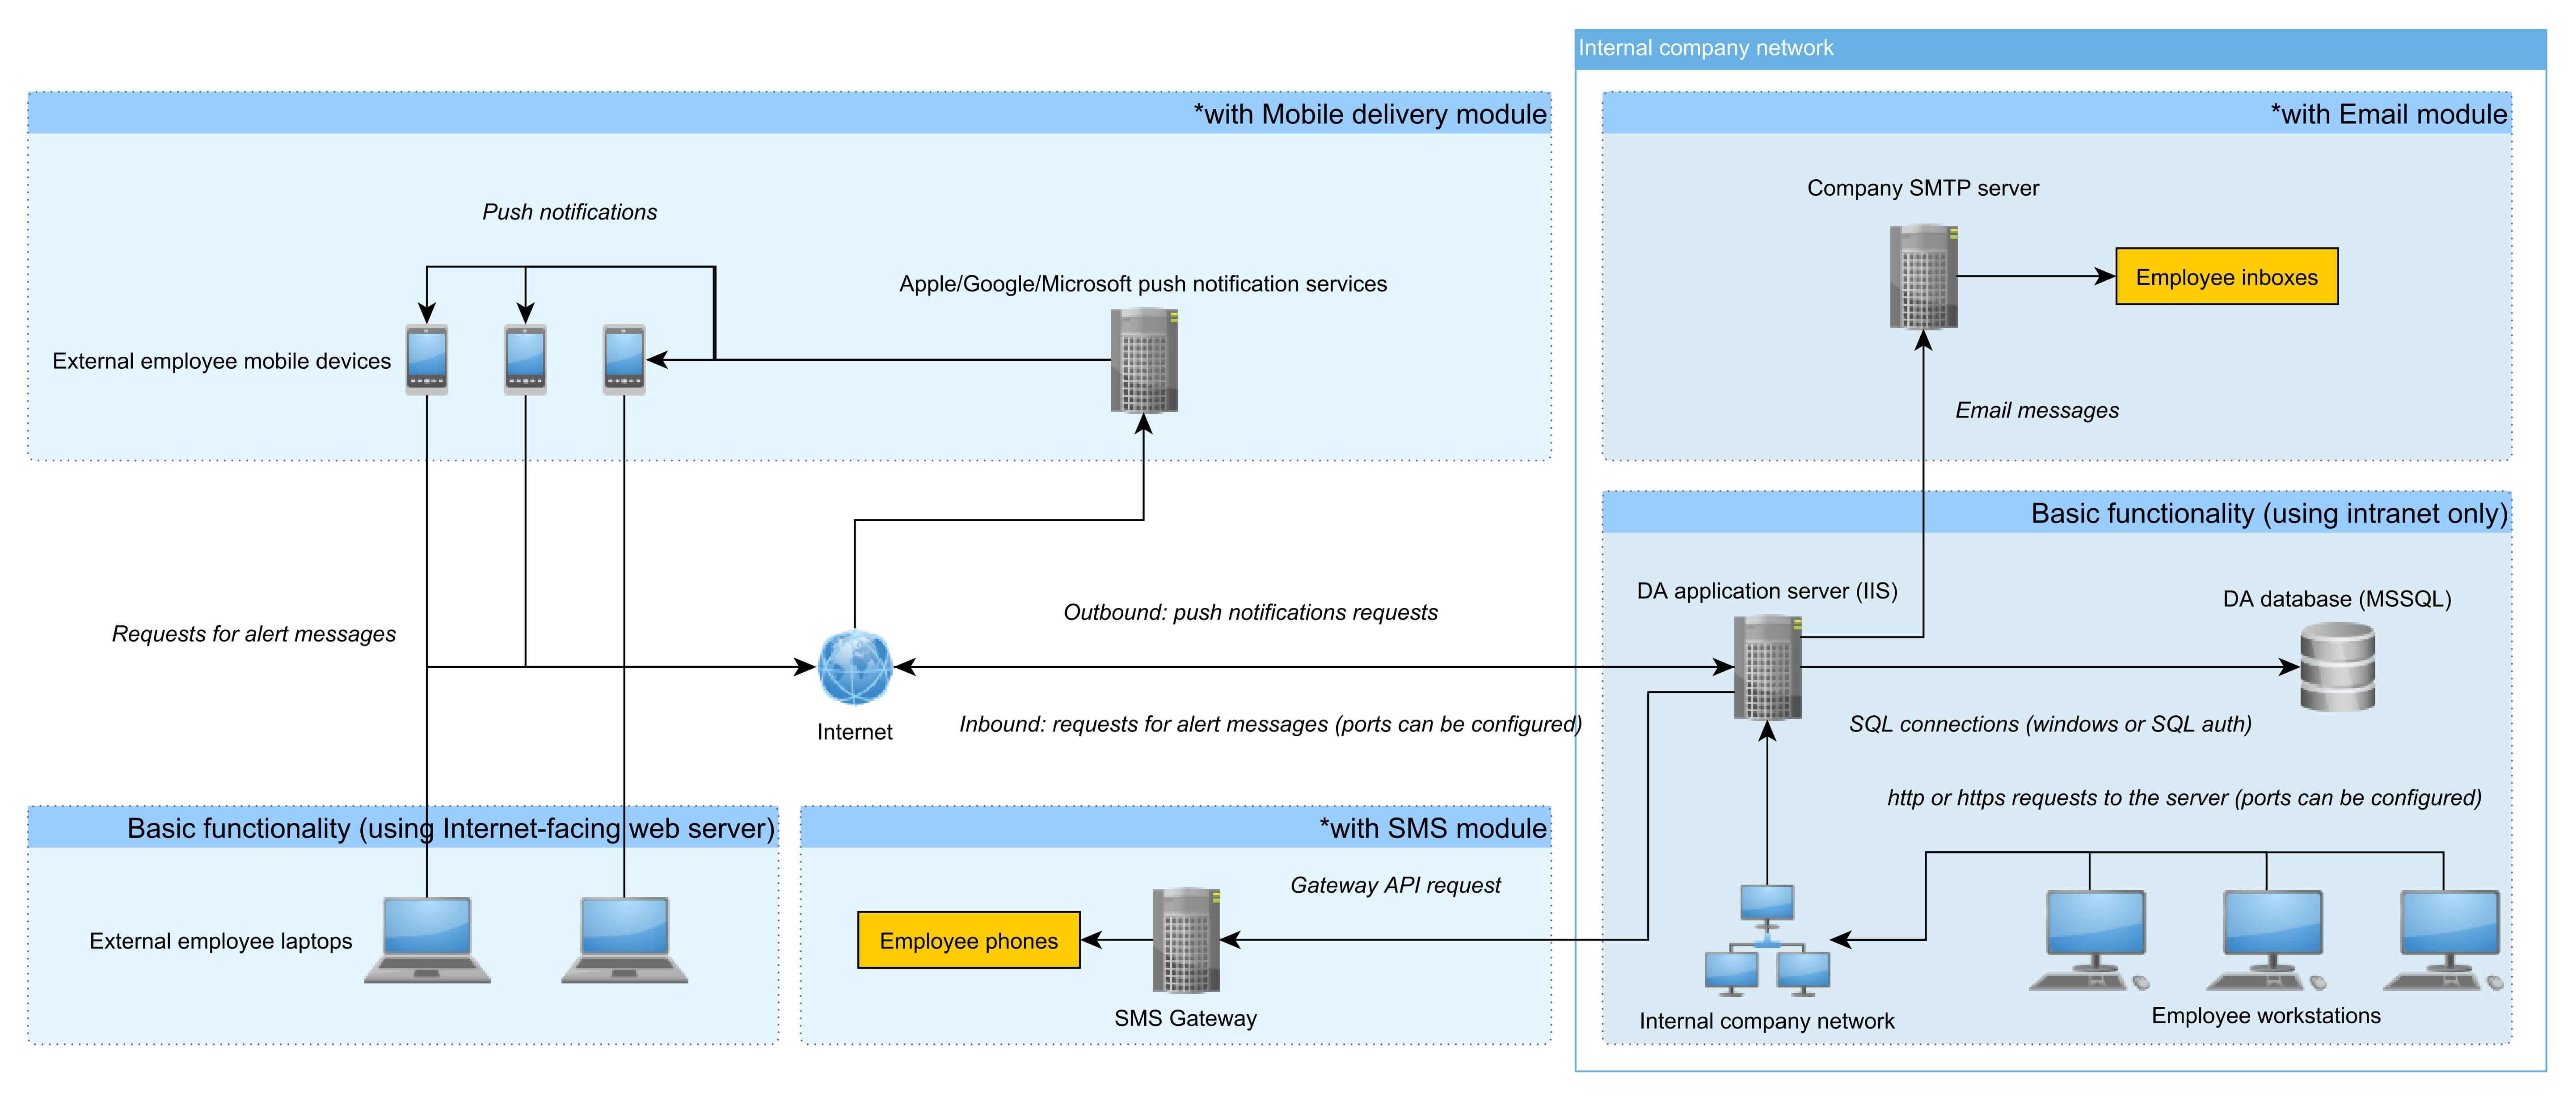 DeskAlerts API - Alert System with Third Party API Integration